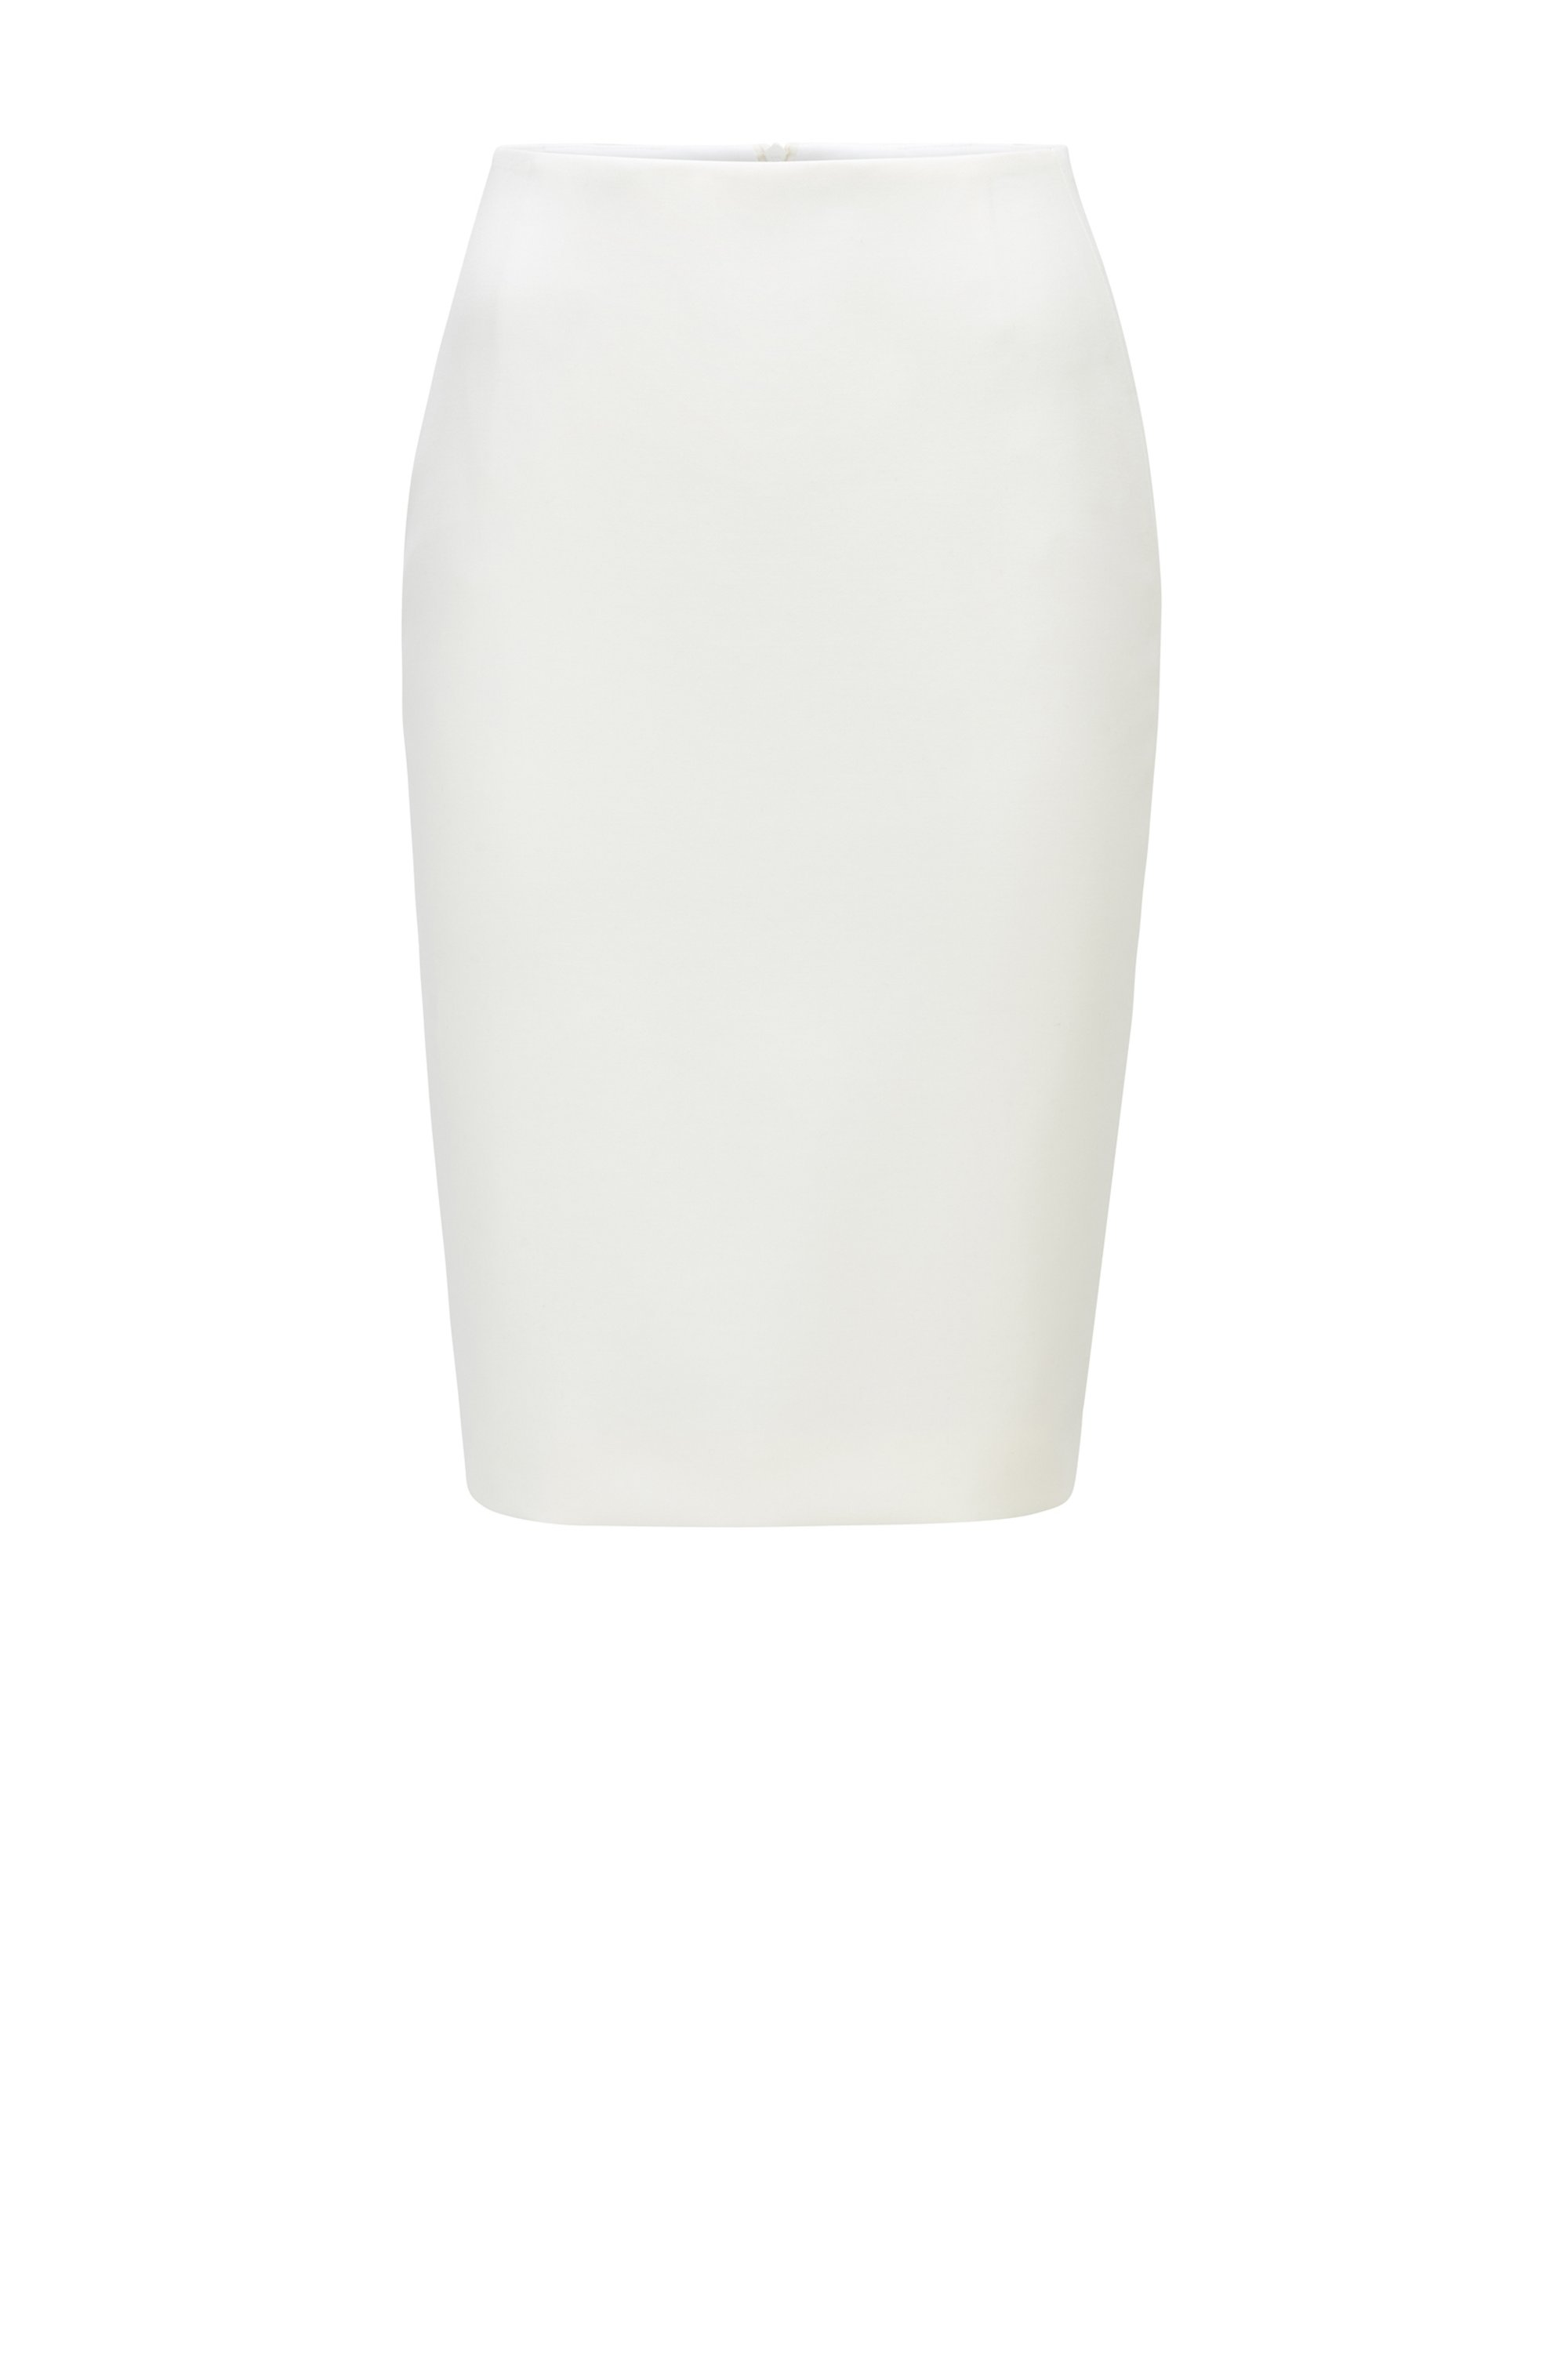 Slim-fit pencil skirt in Portuguese stretch fabric, White